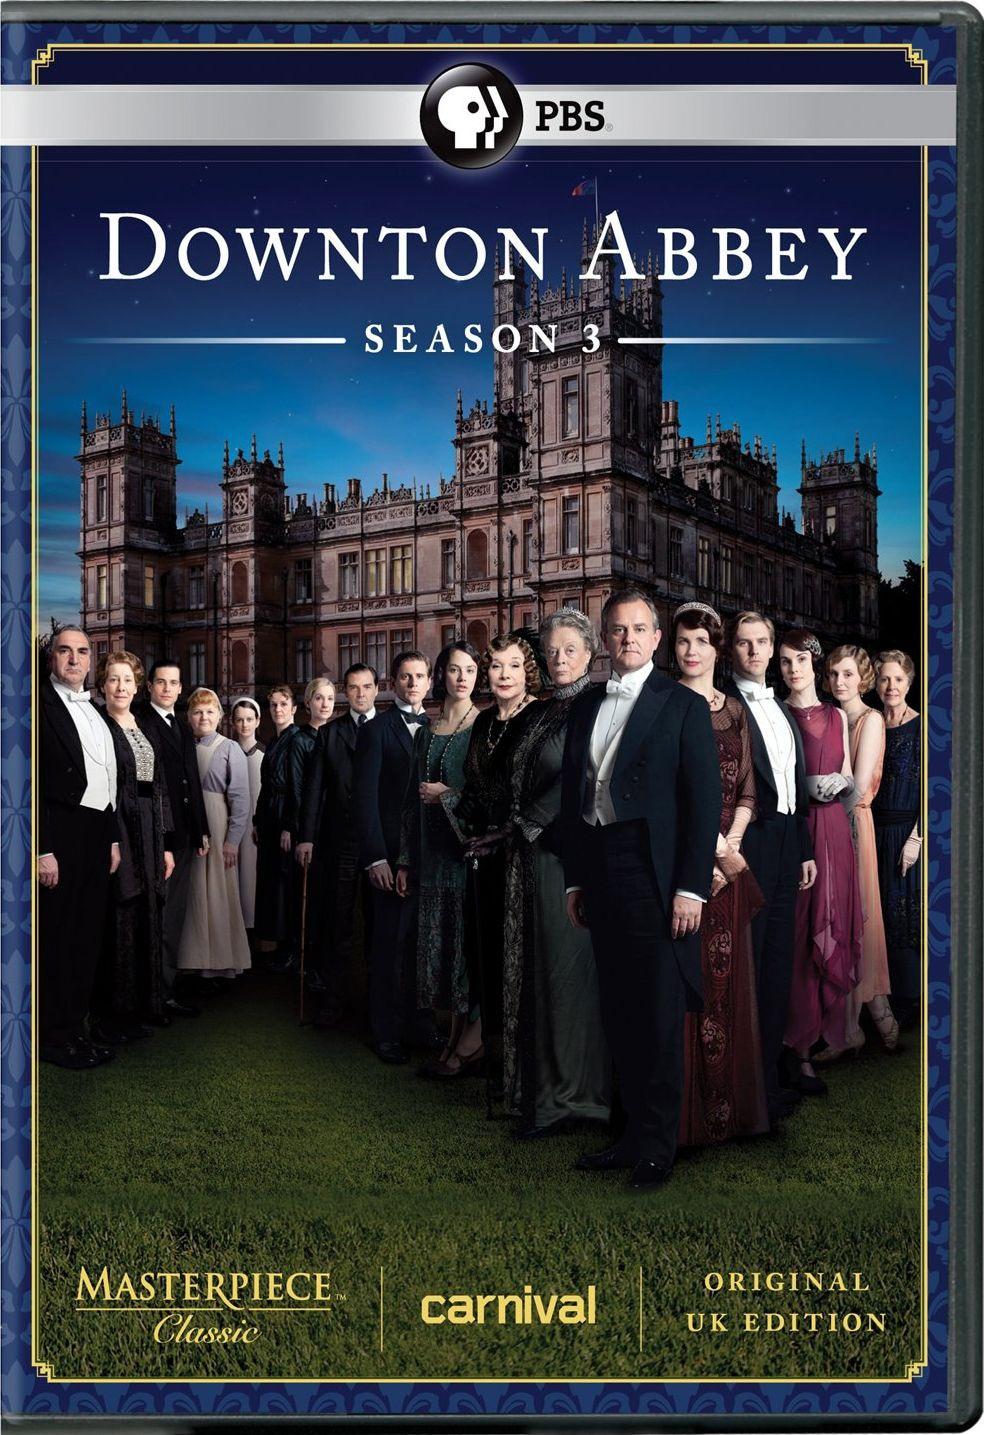 Masterpiece Classic: Downton Abbey: Season 3 (DVD)